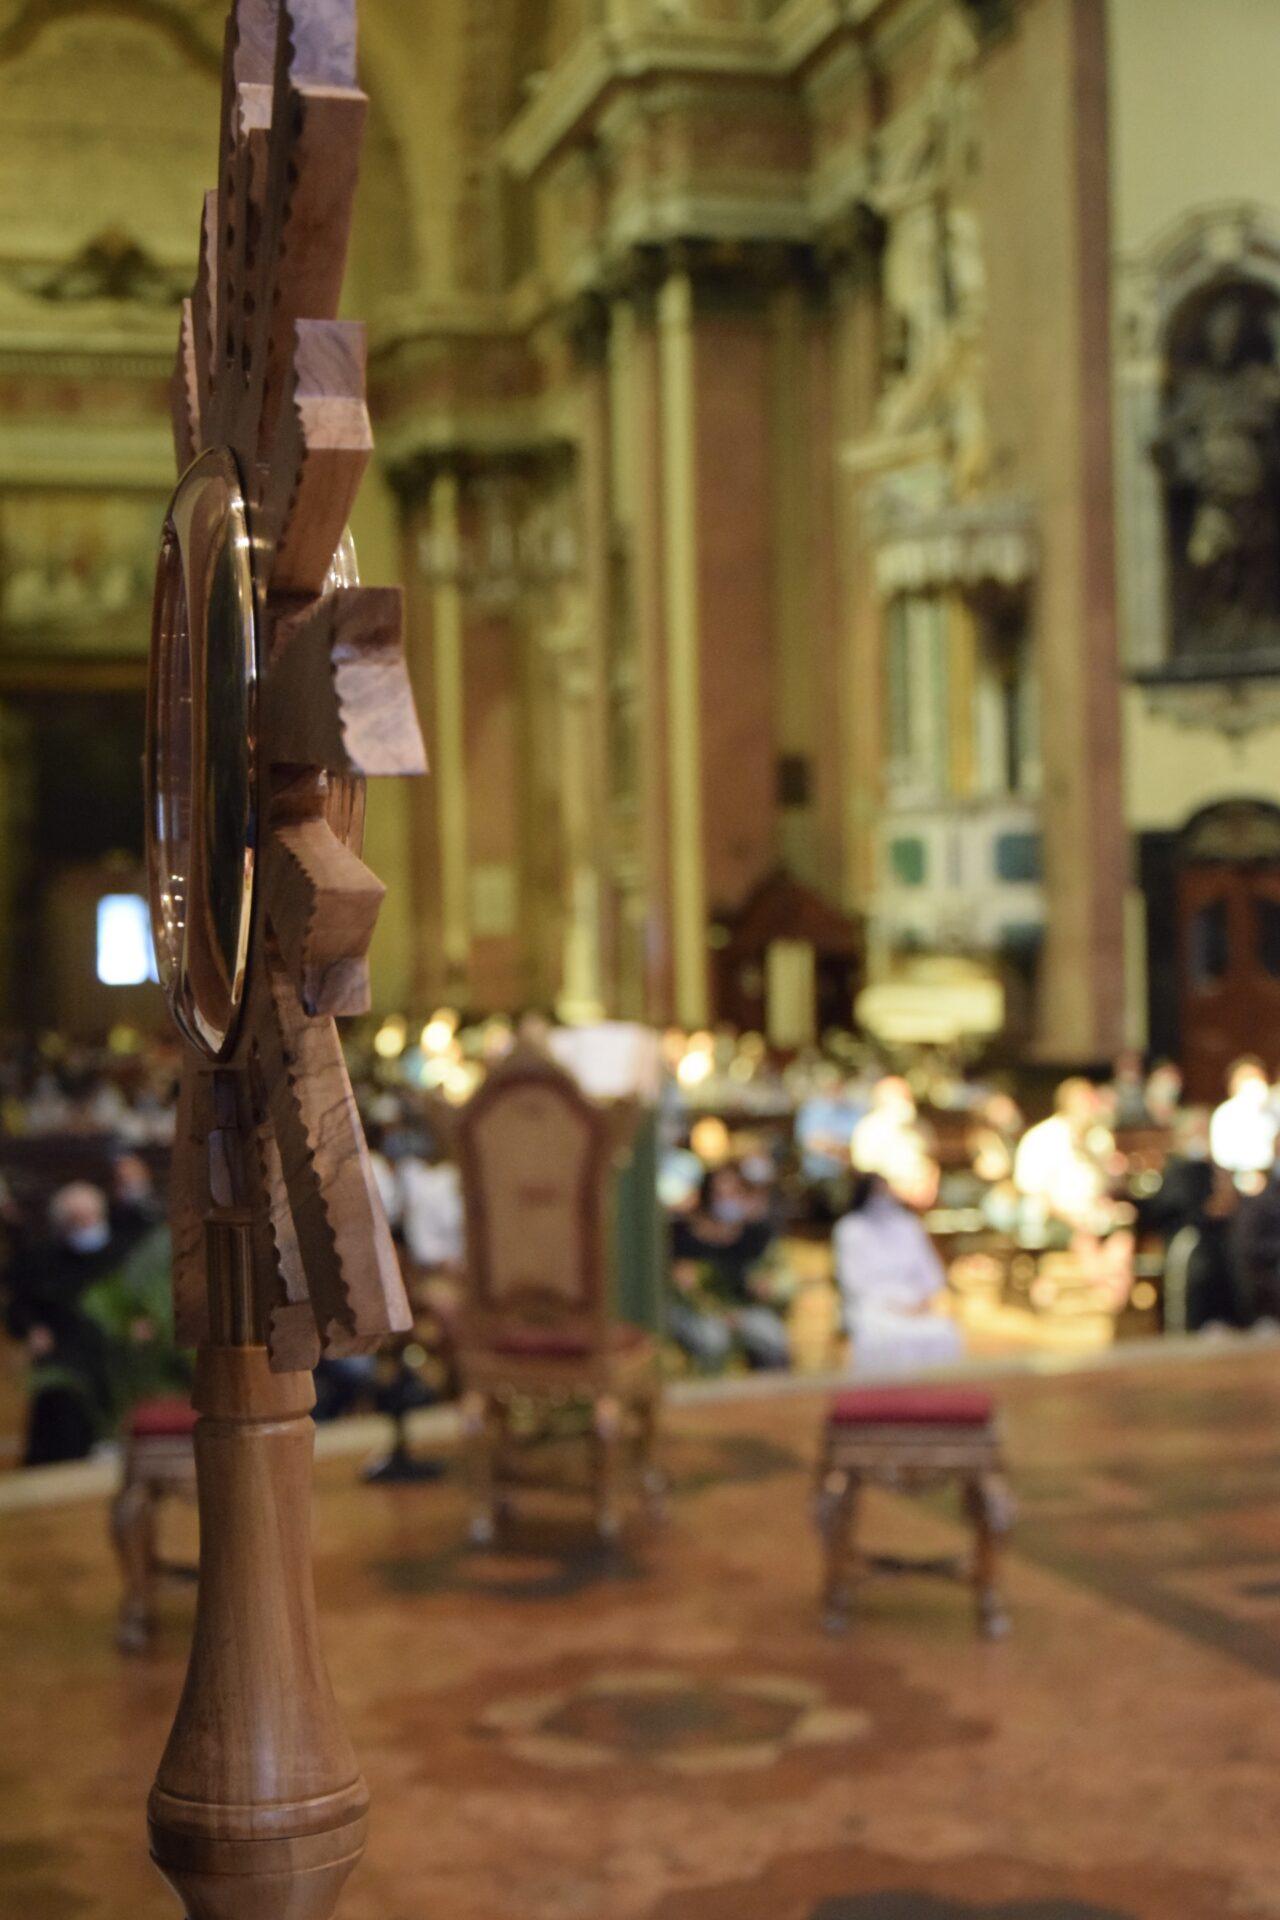 213910 / 24-27.11.21. Italija pouka o molitvi i šutnja Reggio Emilia